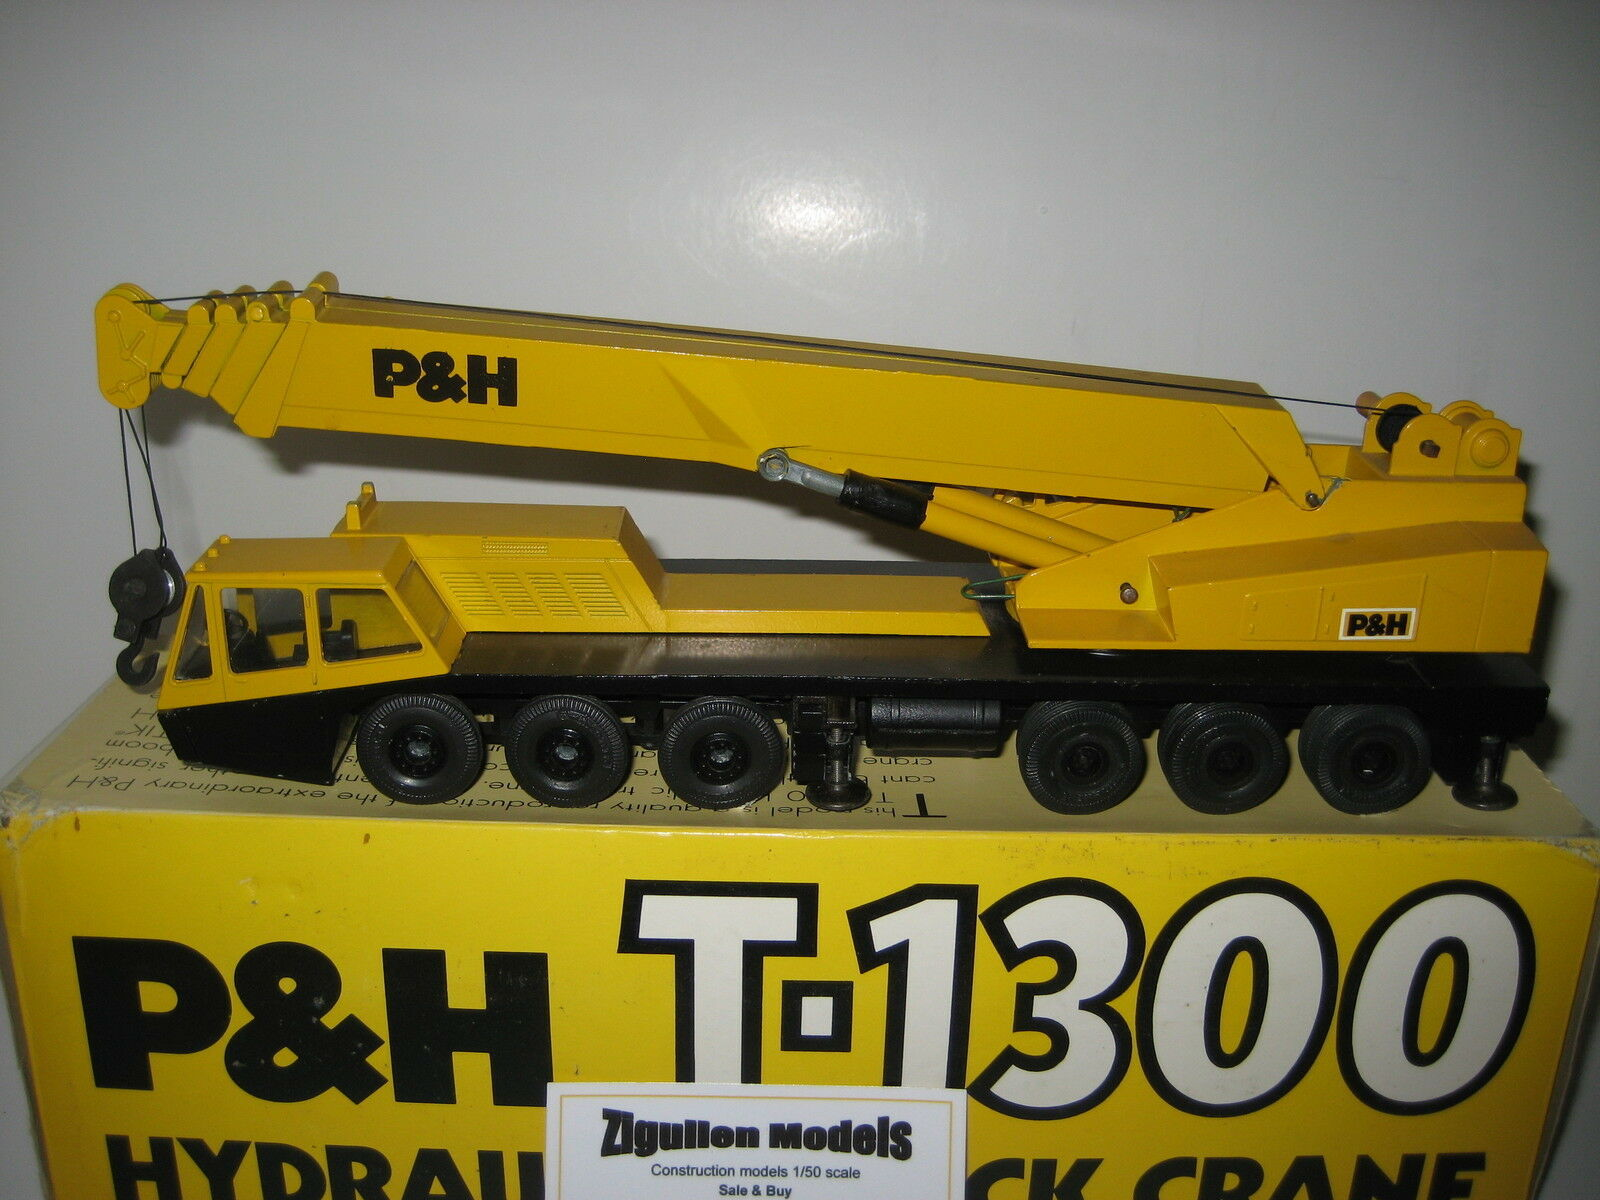 P&h T-1300 Auto Crane Metal Rims  3071.1 GESCHA 1 50 OVP